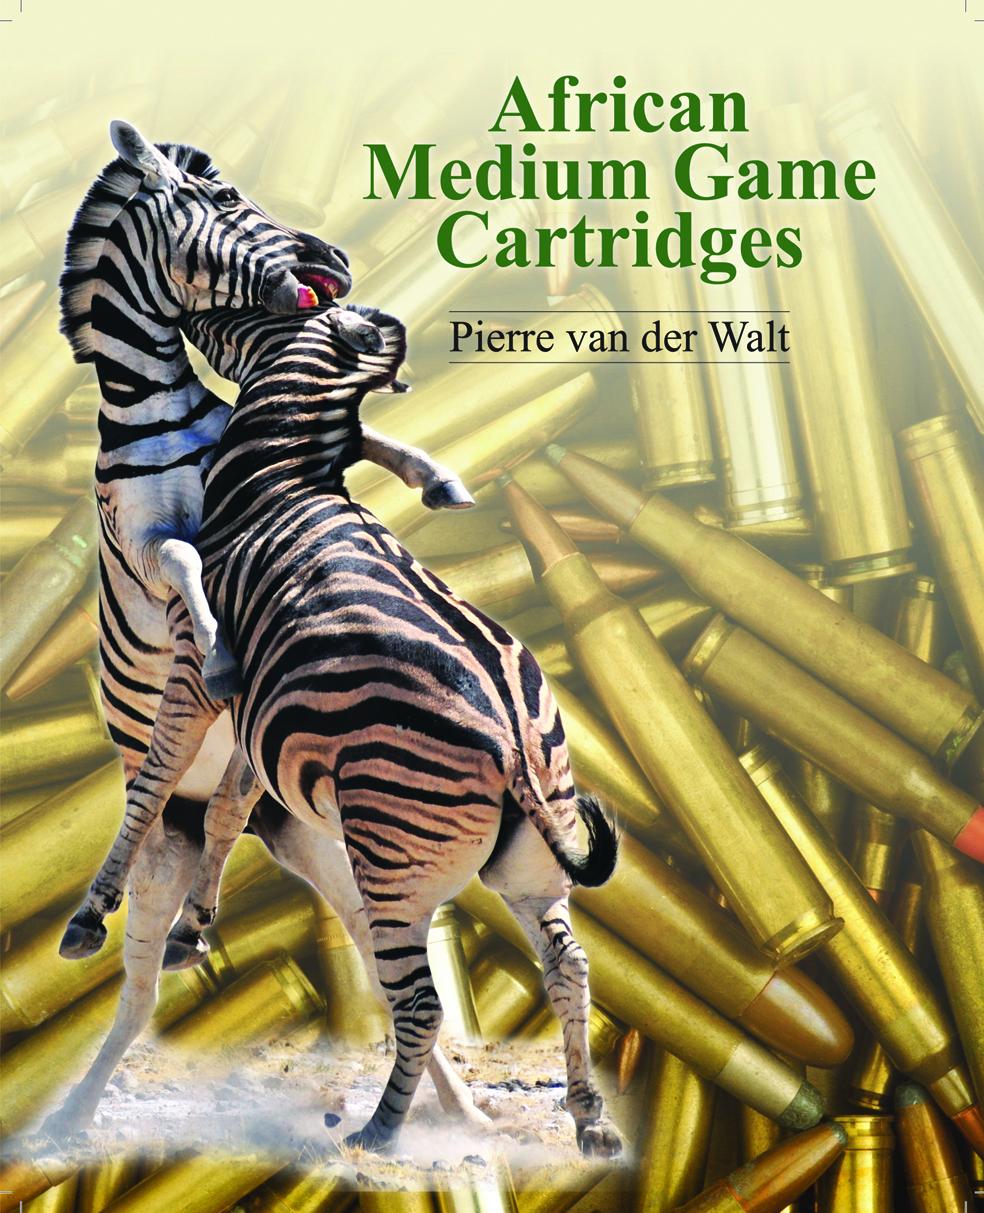 Cover-African-MEDIUM-Game-Cartridges.jpg